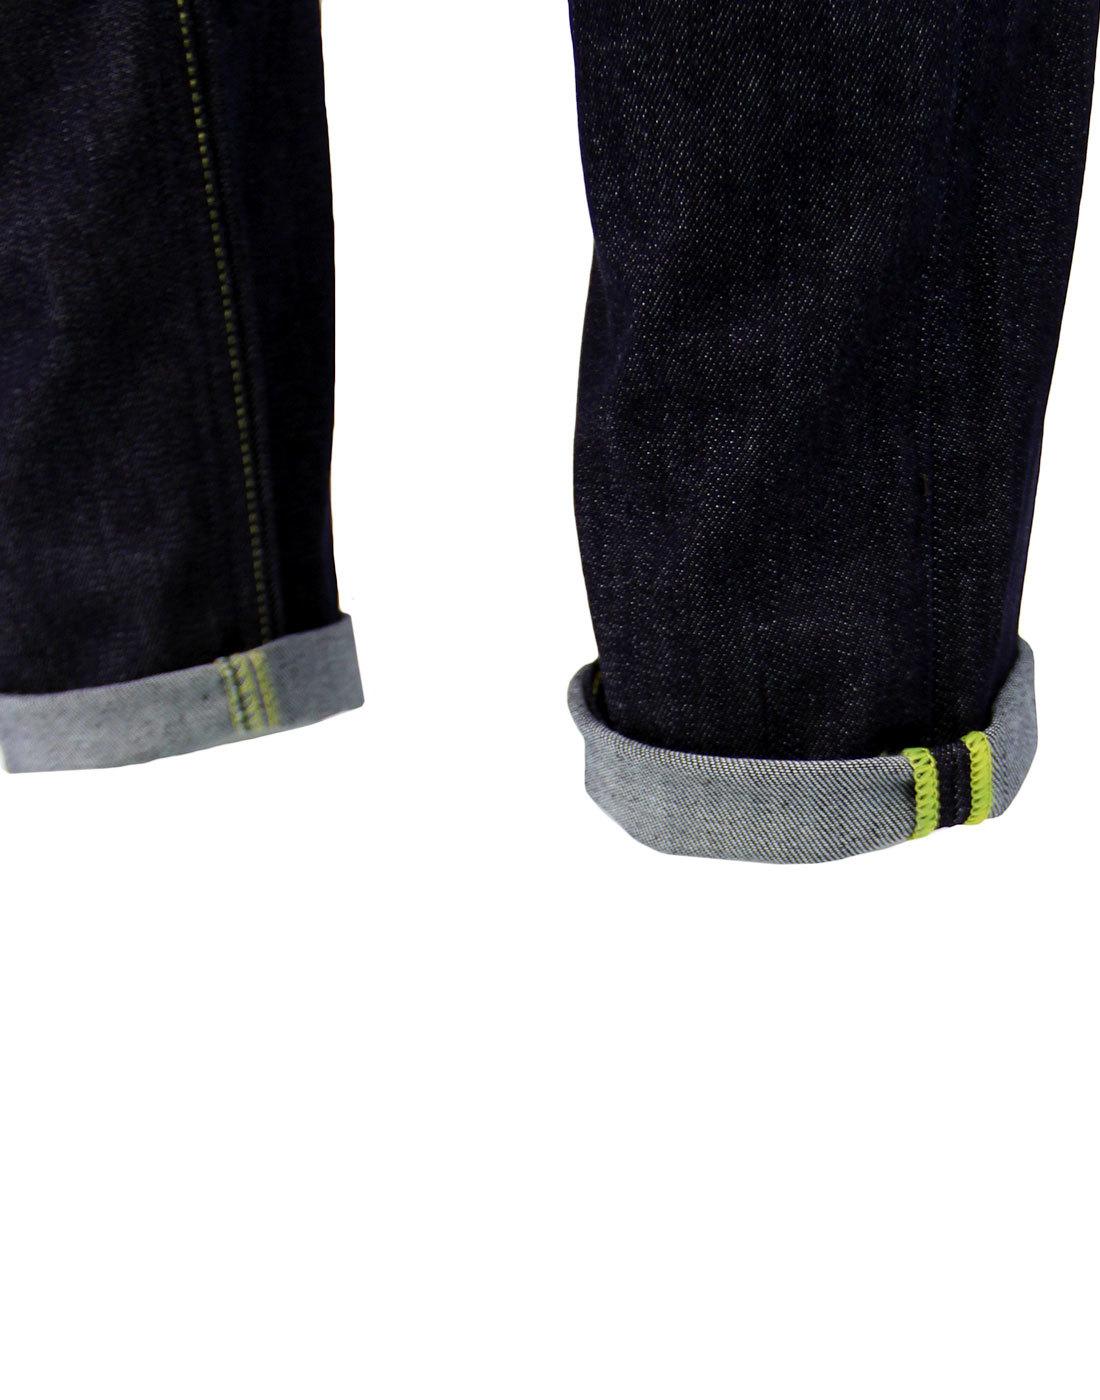 44fe6187 Luke LEE Retro Indie Mod Slim Tapered Denim Jeans in Urban Dark